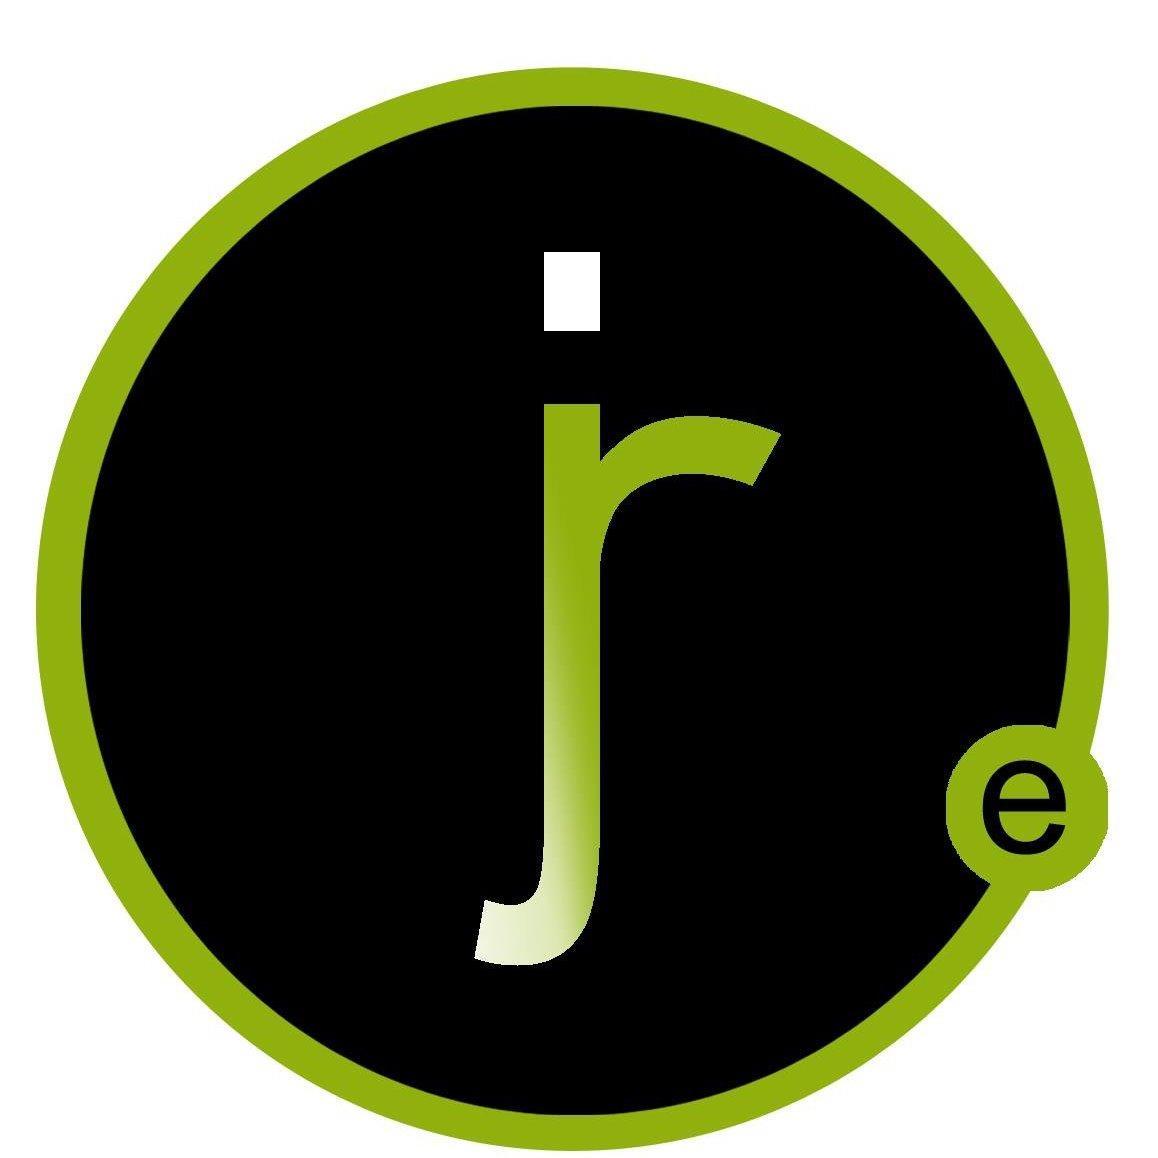 JR Electronics